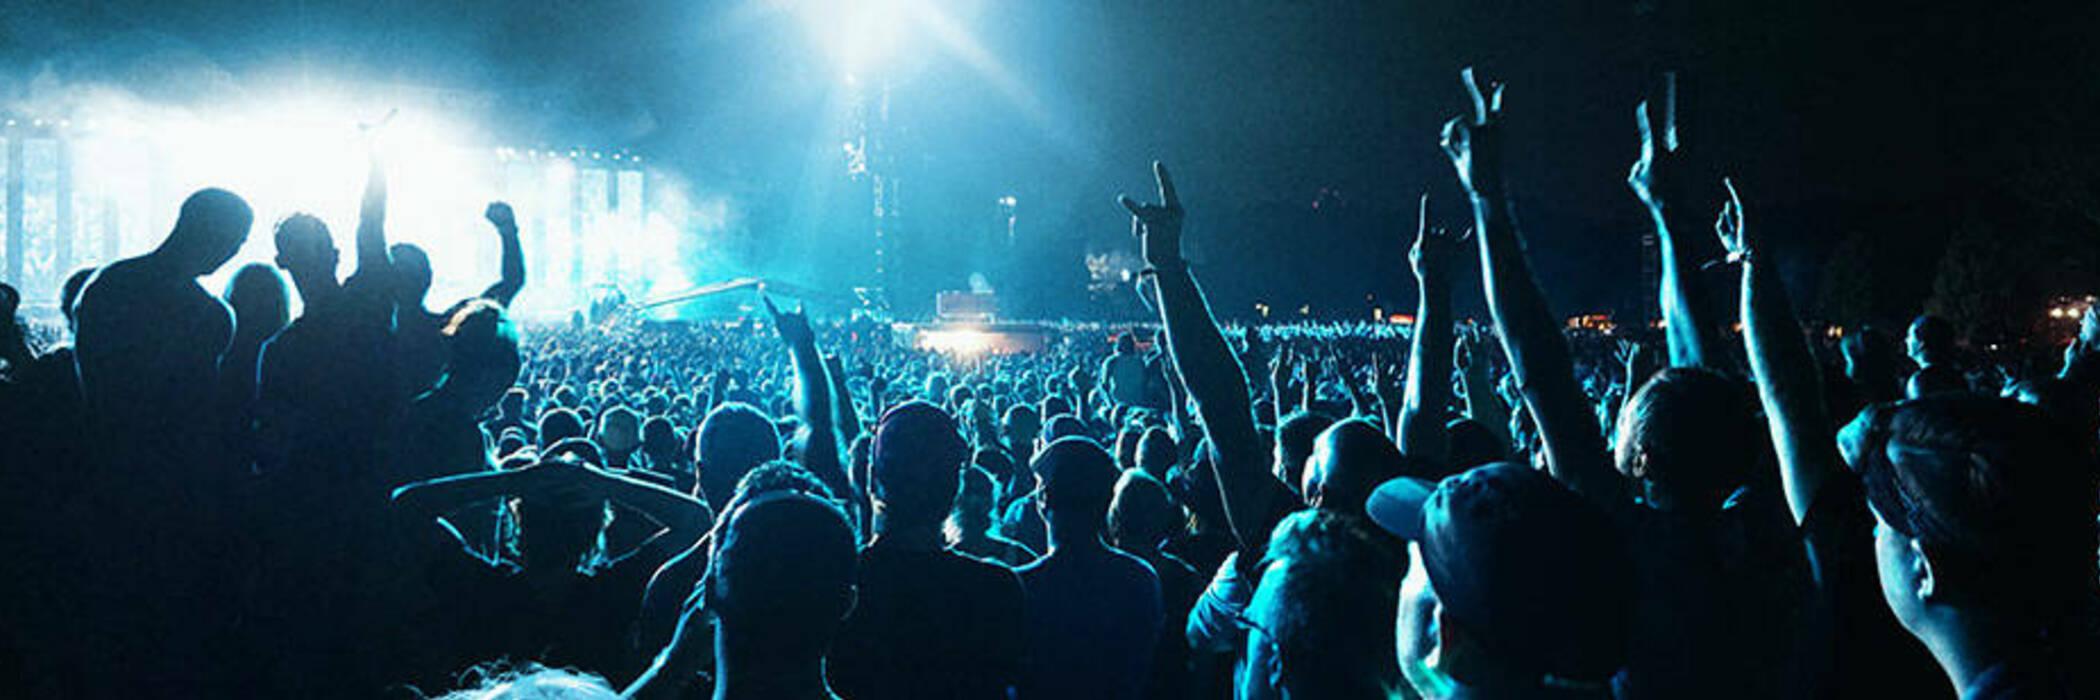 Crowd at a concert at night.